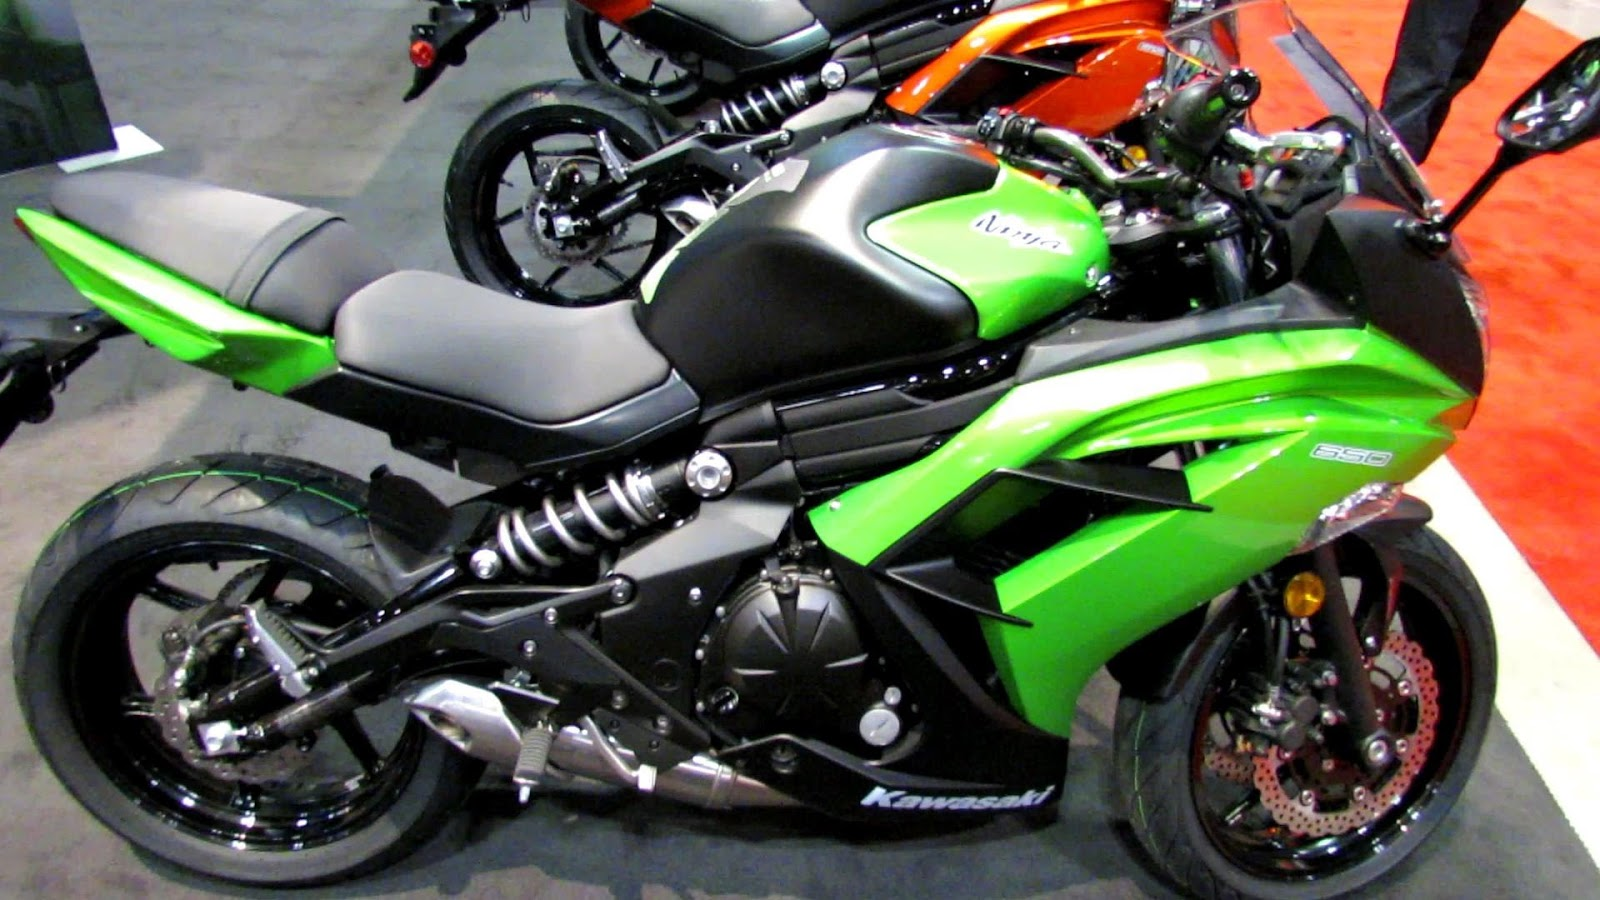 Kawasaki Ninja 300 Velocidade Final Automotive News